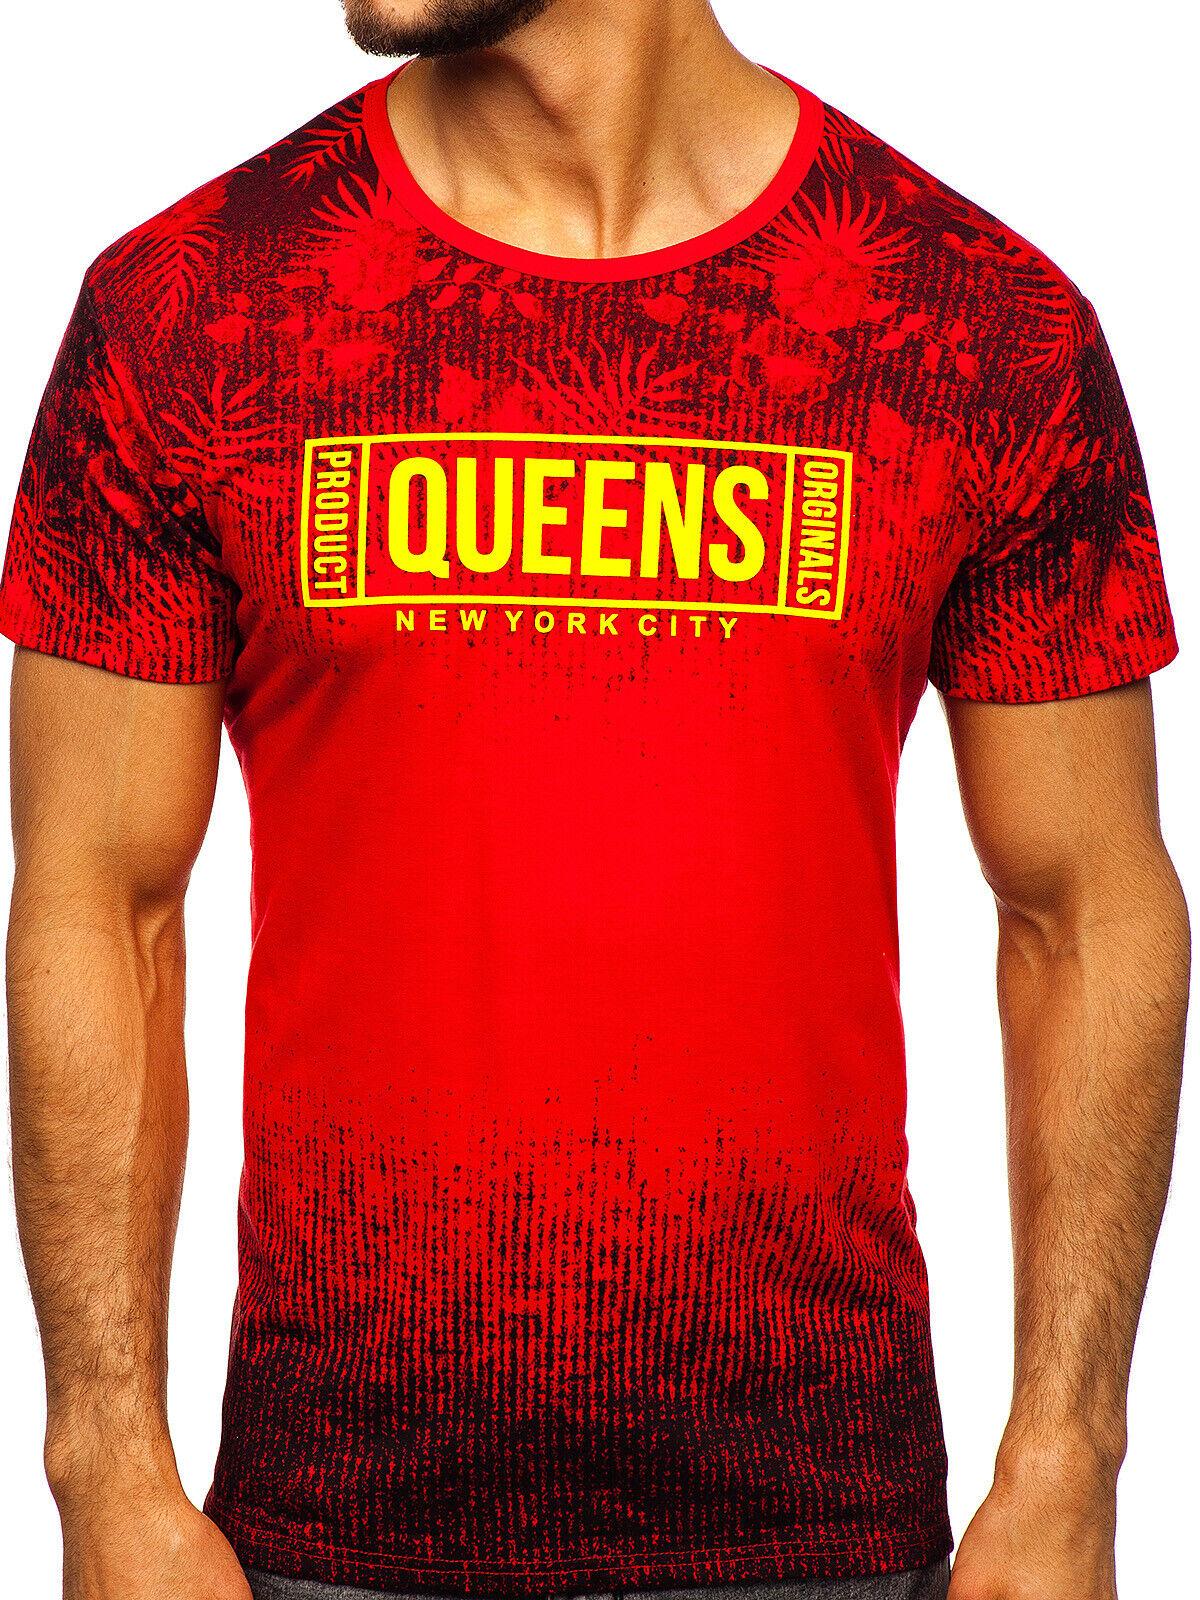 T-Shirt Tee Kurzarm Classic Casual Print Rundhals Aufdruck Herren BOLF 3C3 Motiv